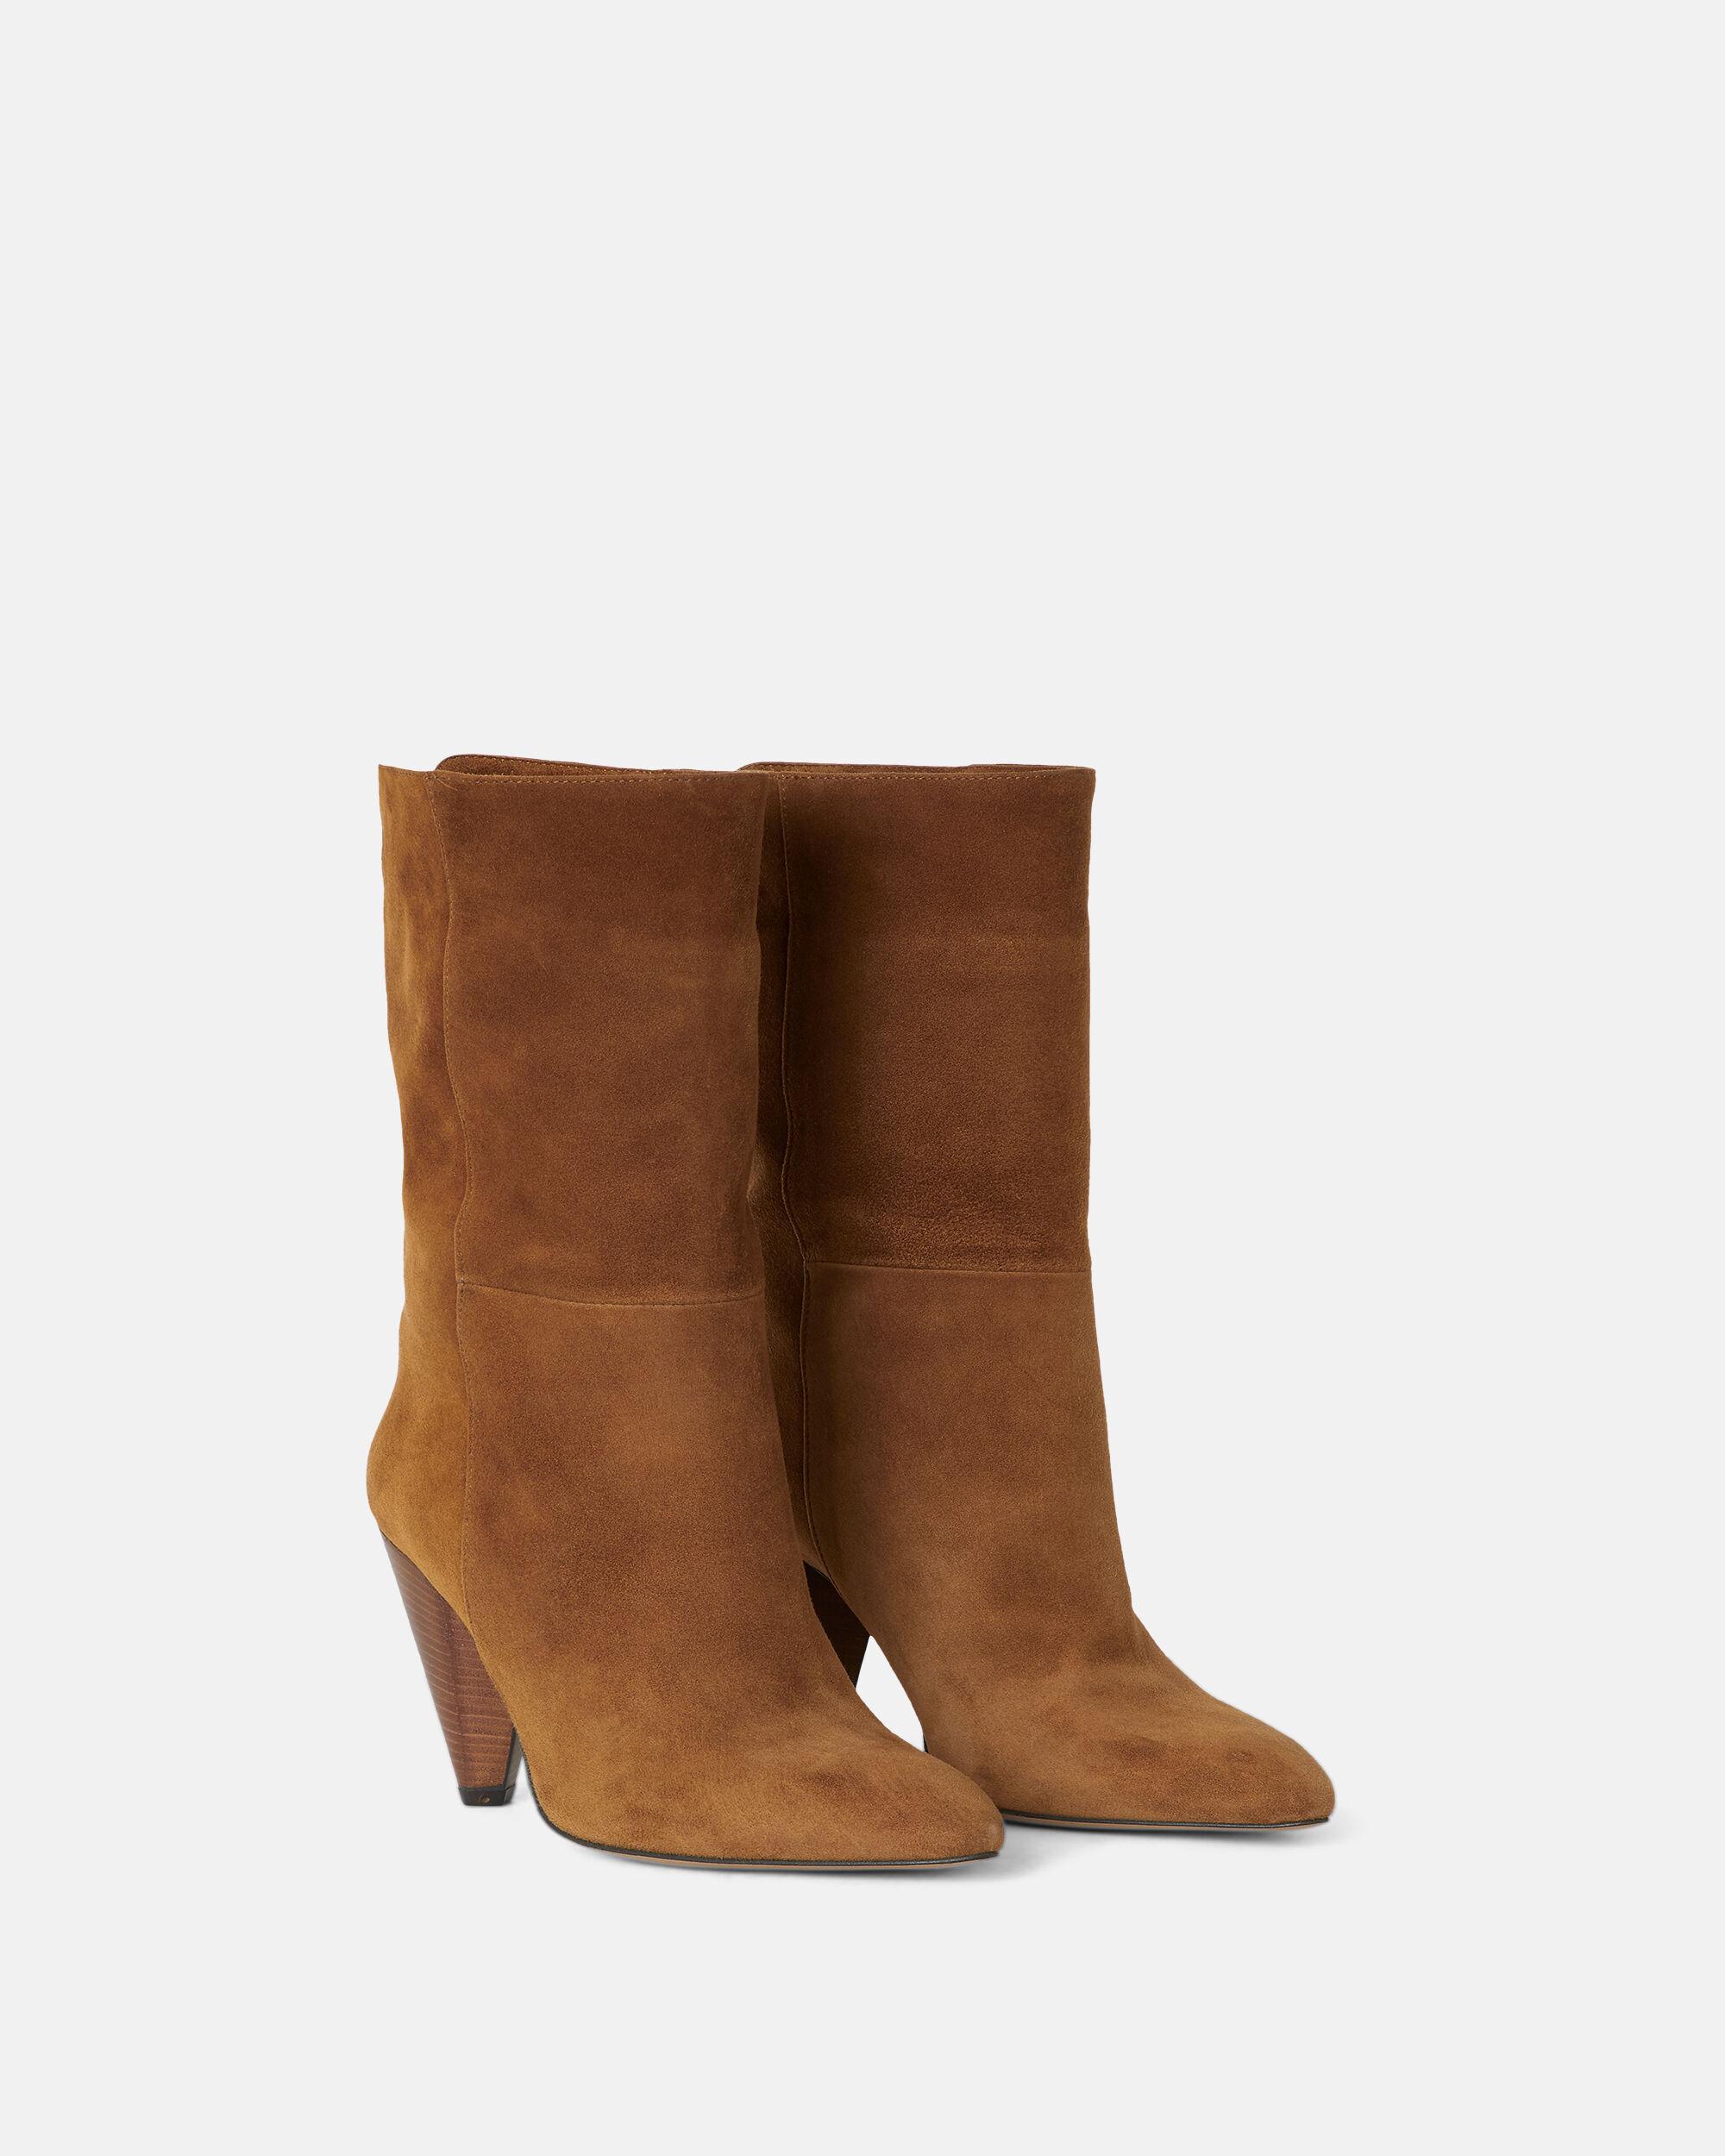 Minelli : Chaussures Femme, Homme, Enfant